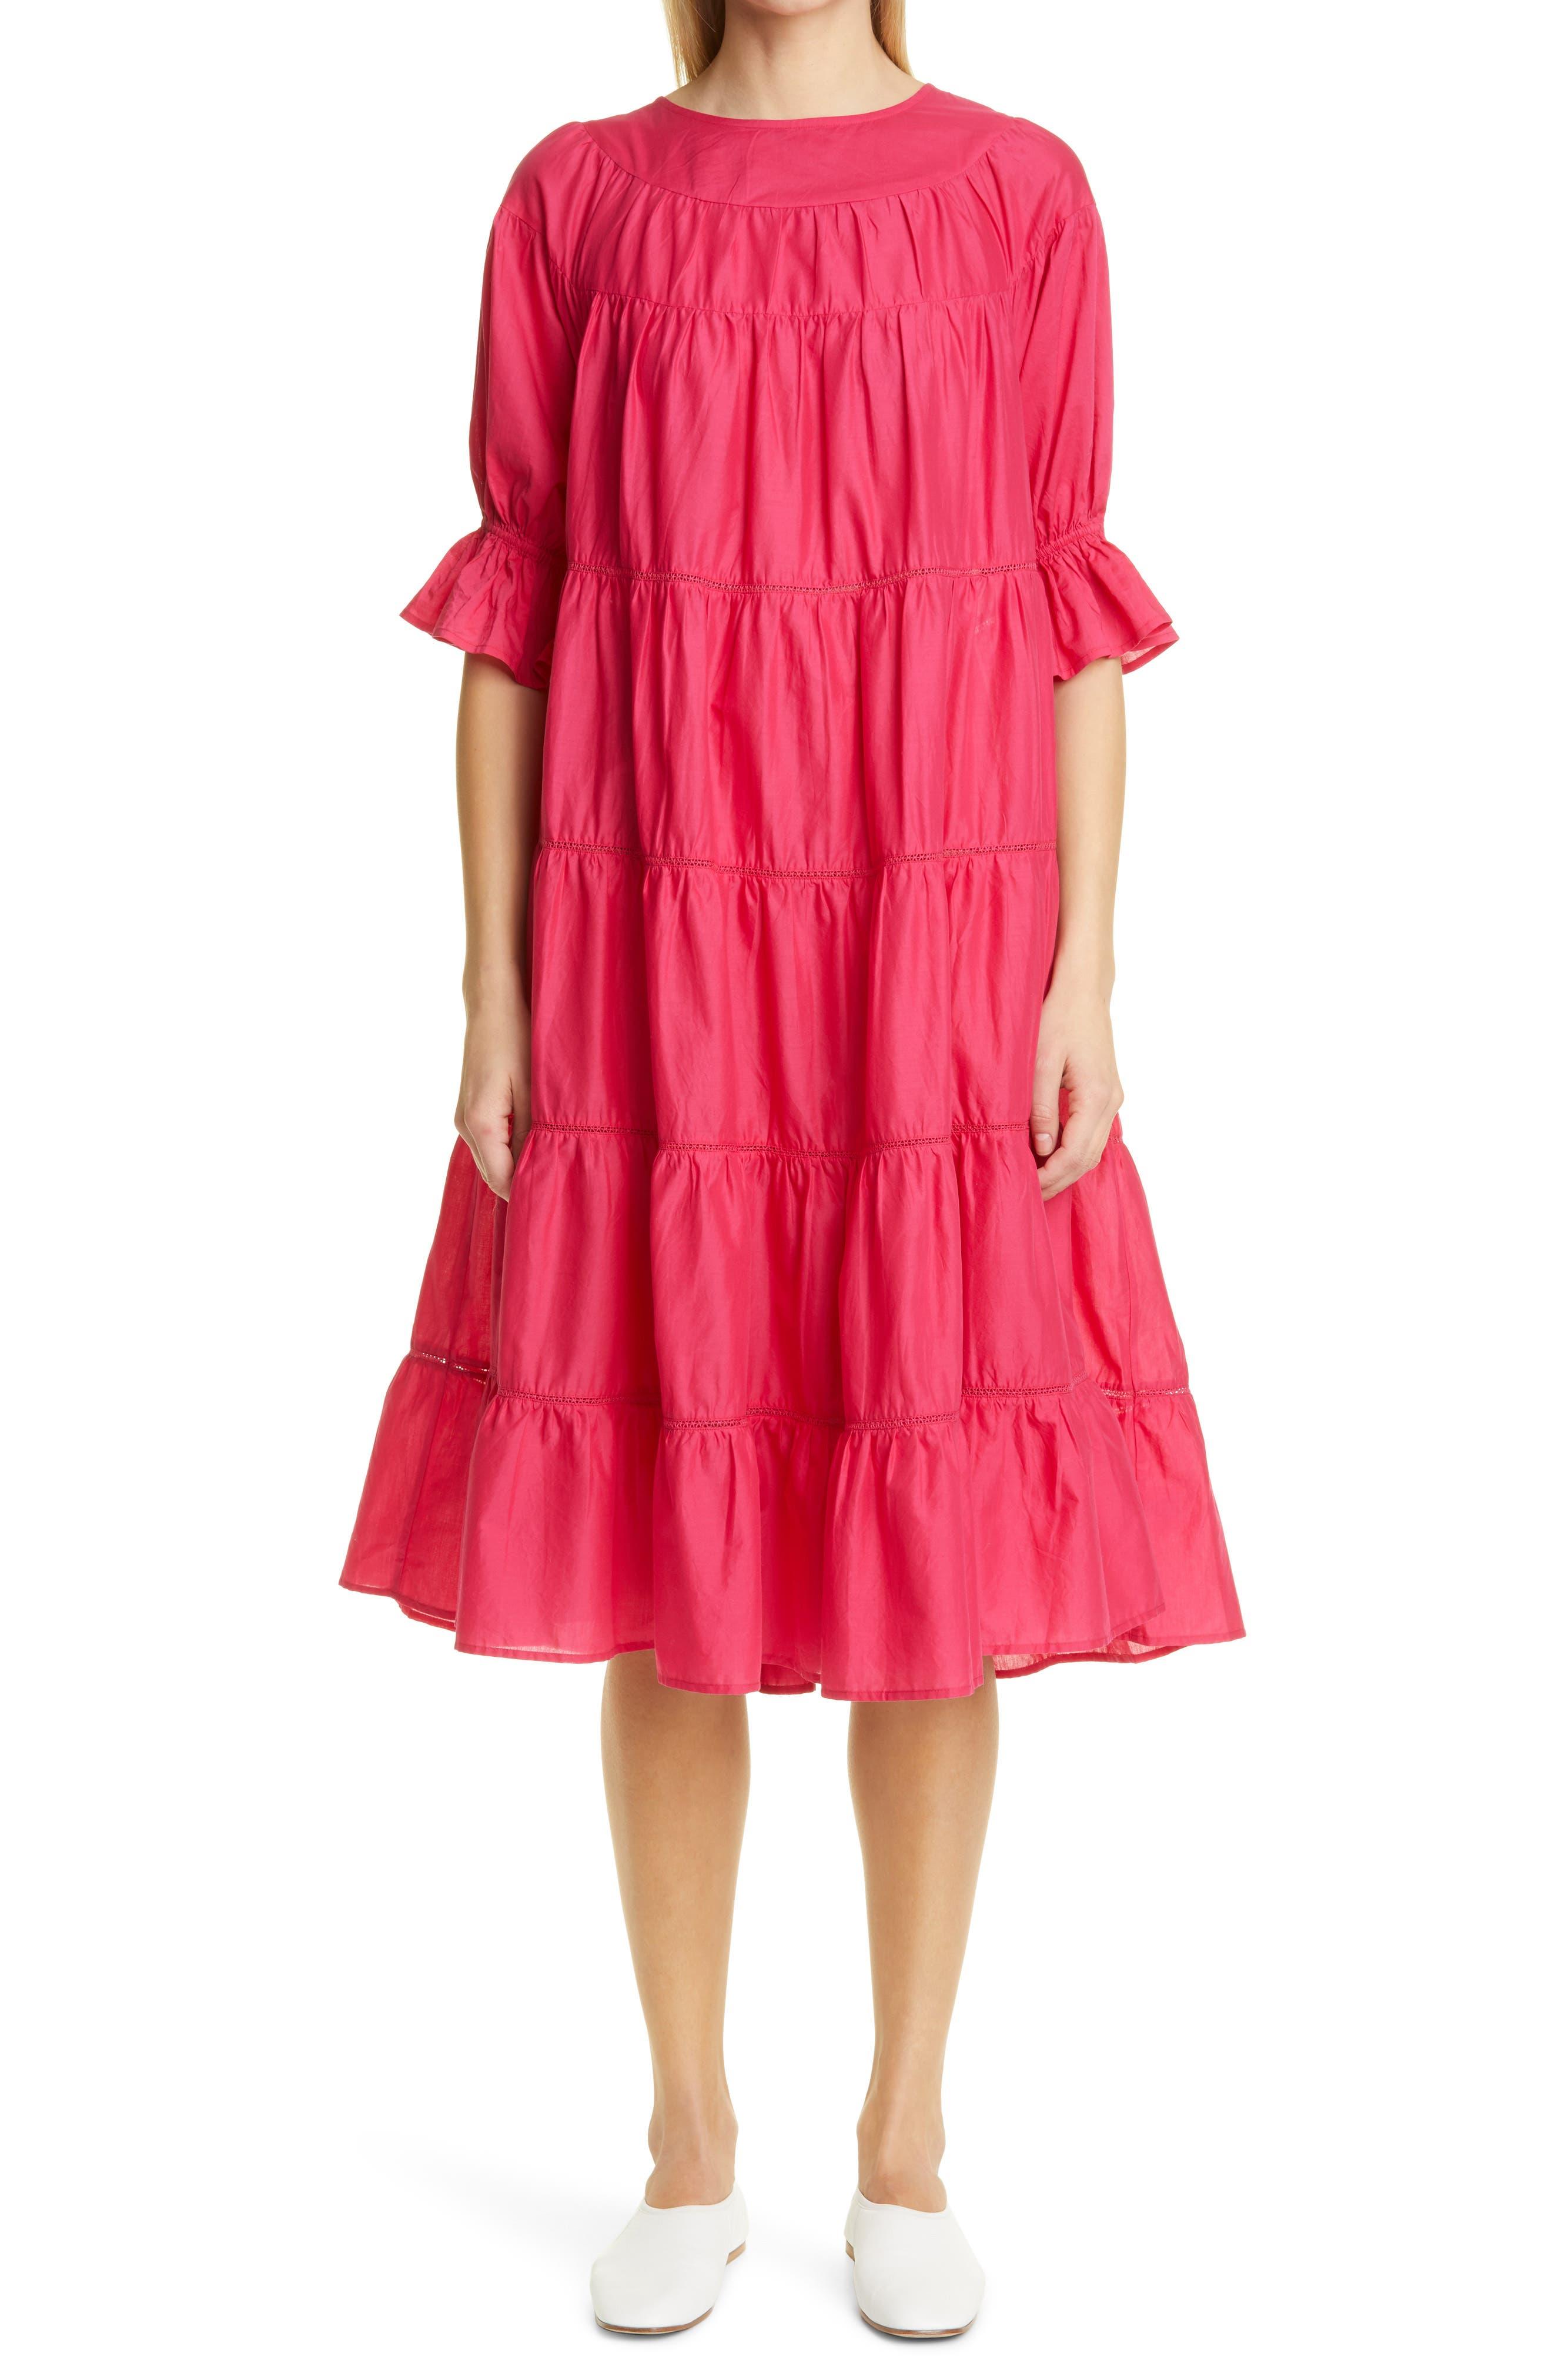 Paradis Tiered Puff Sleeve Cotton Dress